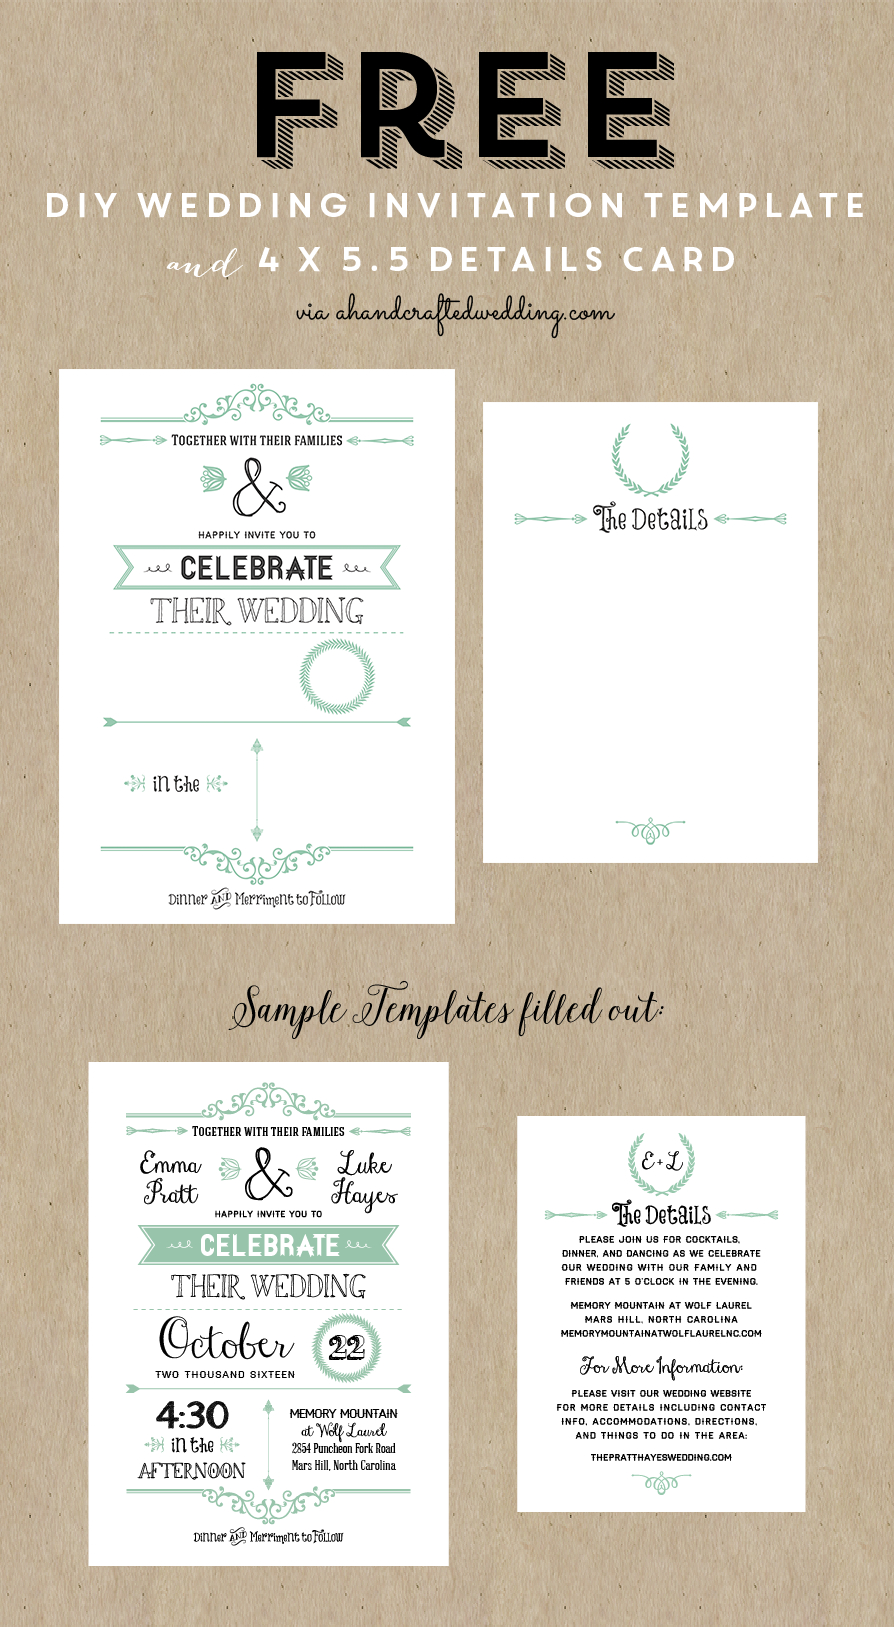 Free Printable Wedding Invitation Template | Wedding | Pinterest - Free Printable Wedding Invitations With Photo